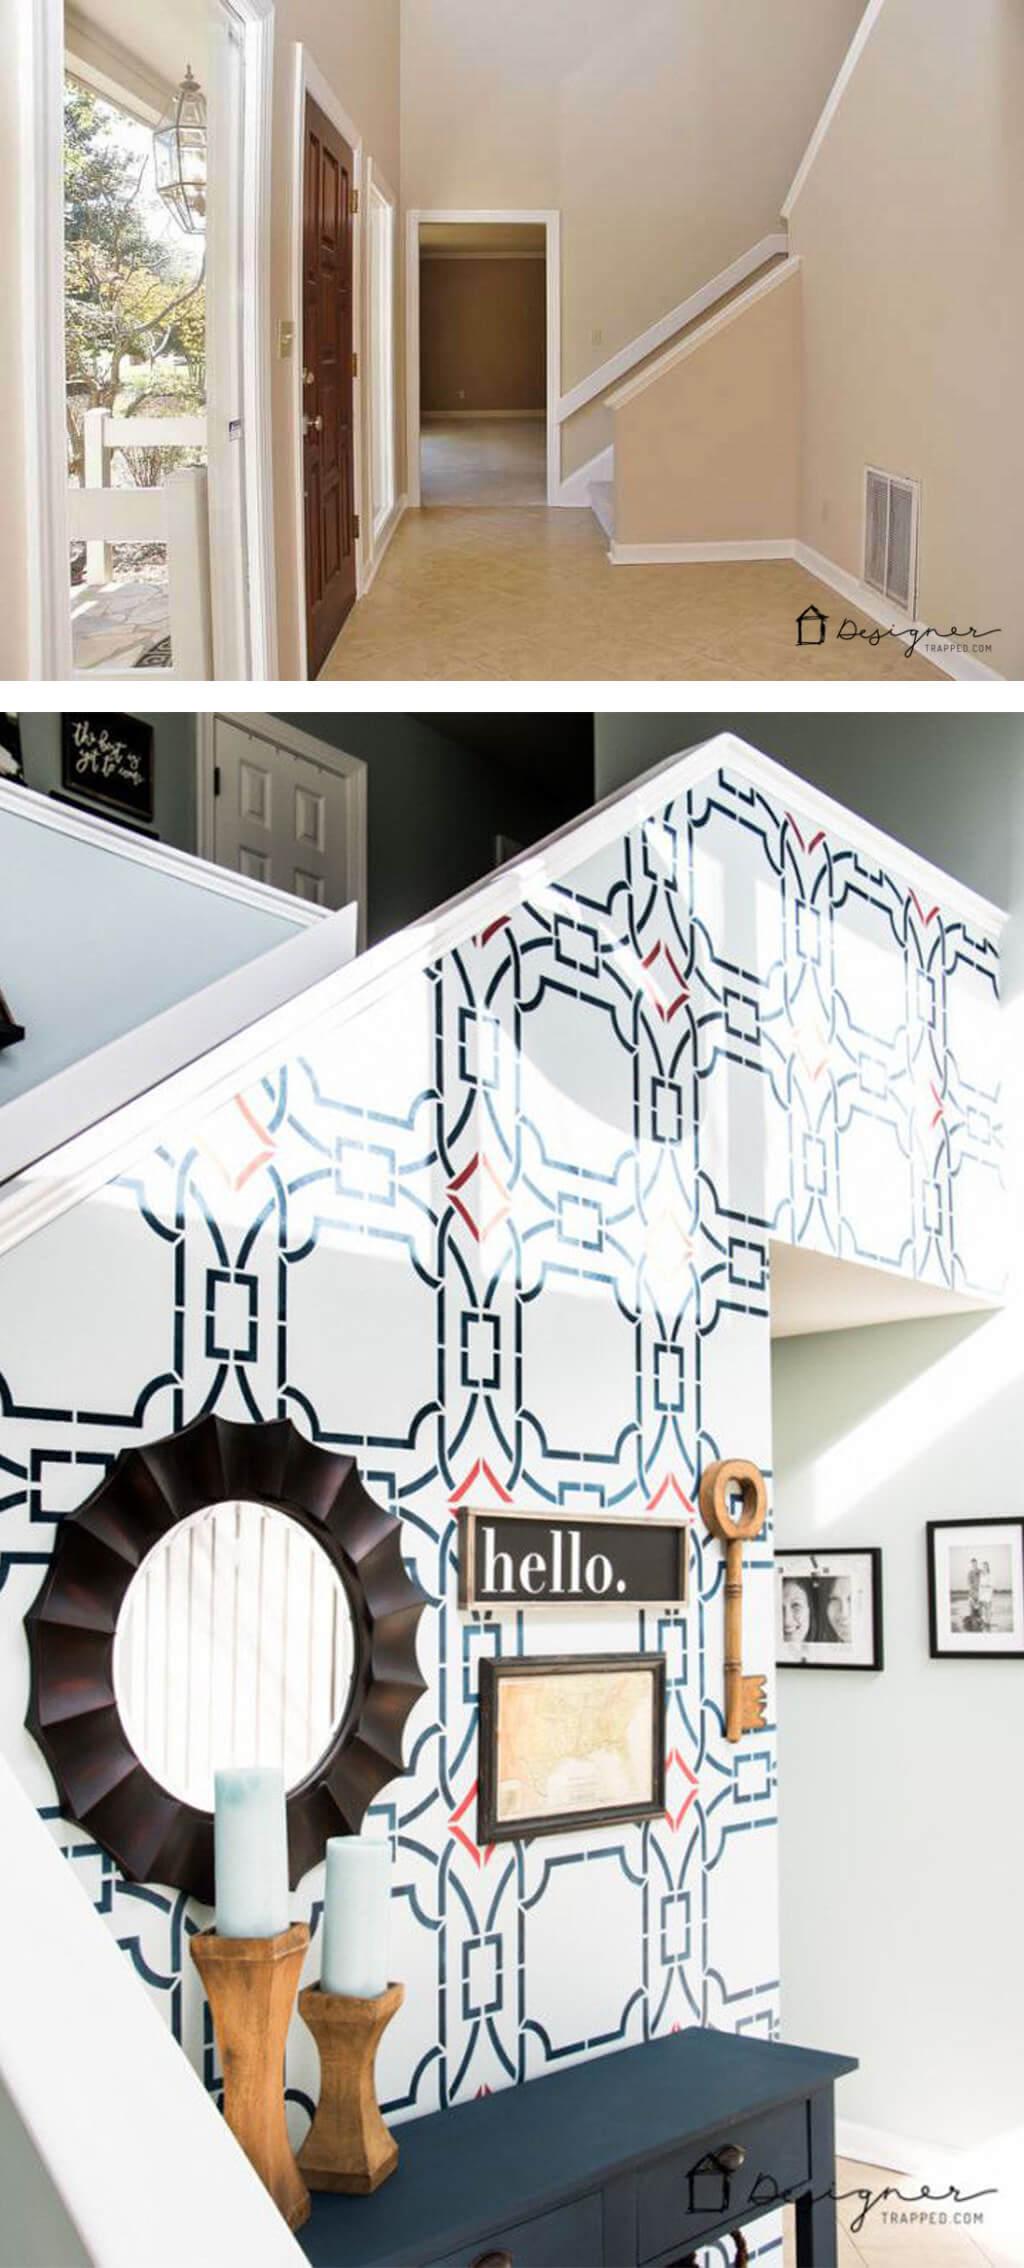 Highbrow Graphic Art Deco Wall Design